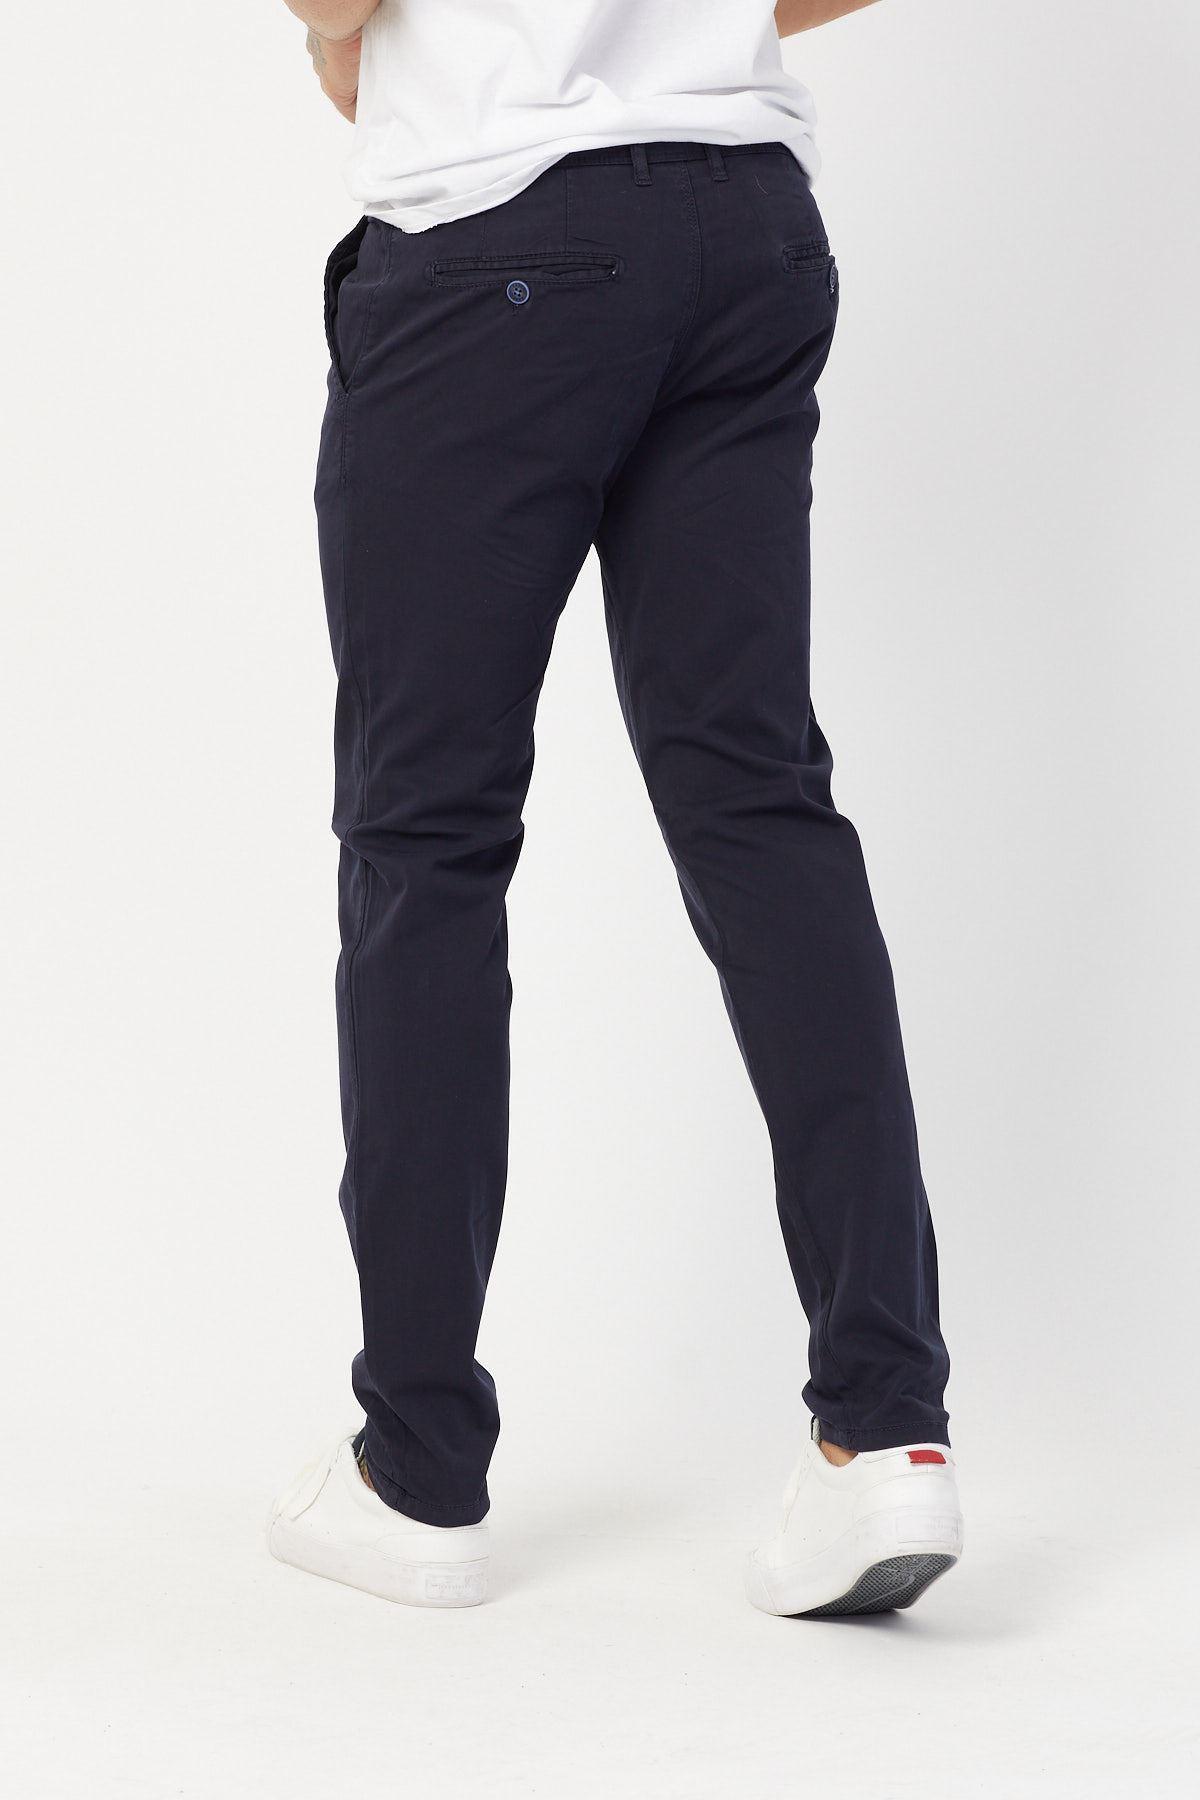 Yandan Cepli Lacivert Keten Pantolon